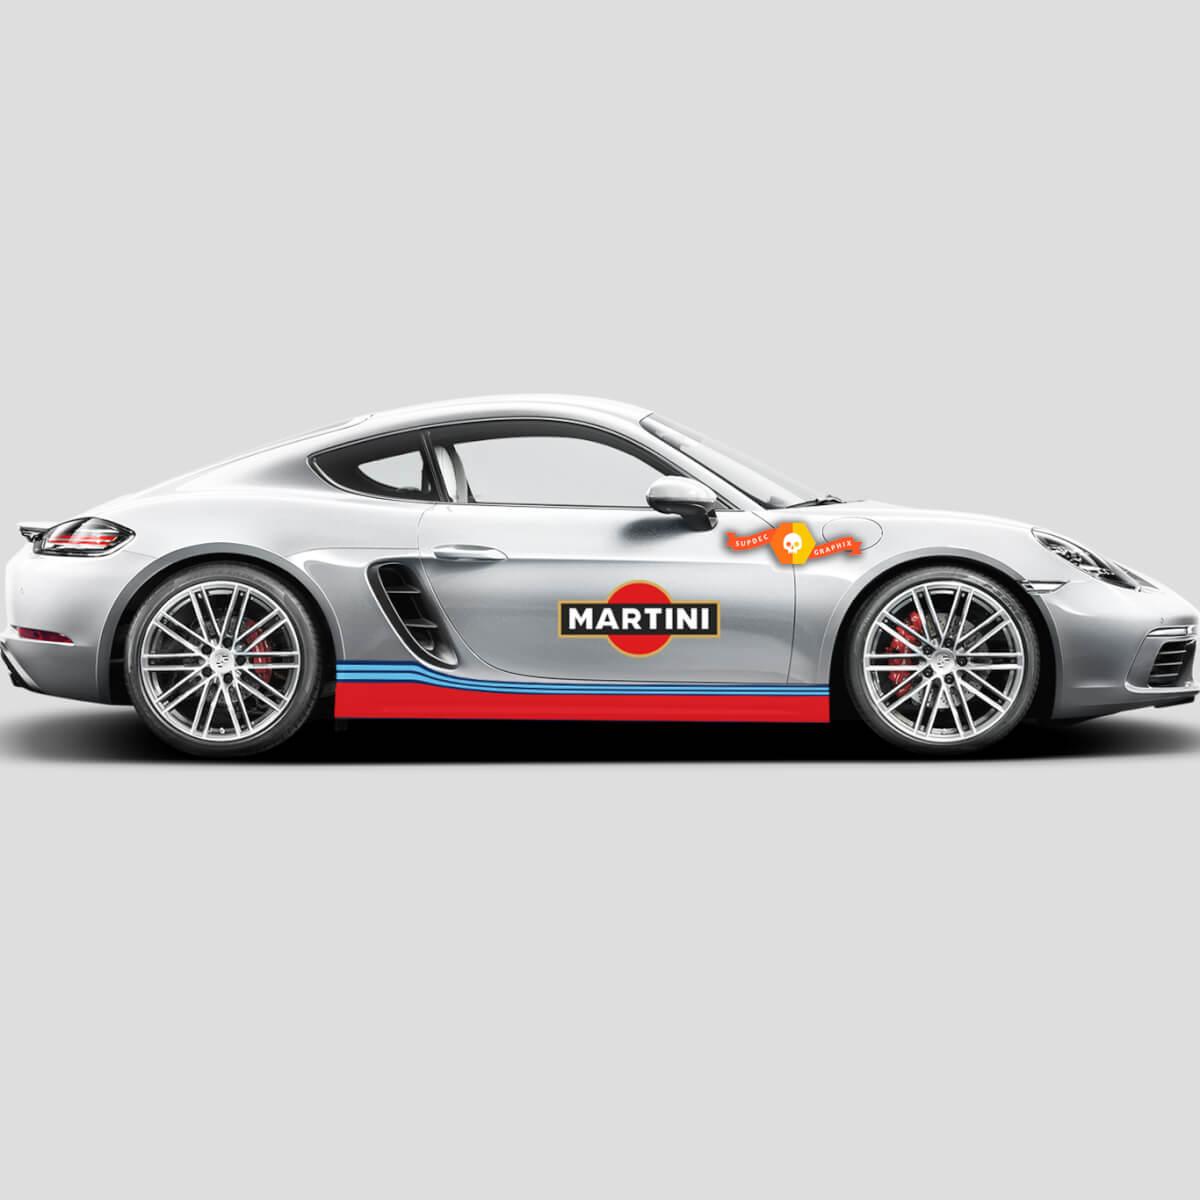 Porsche Cayman Boxster Martini Side stripes Or Any Porsche Full Kit